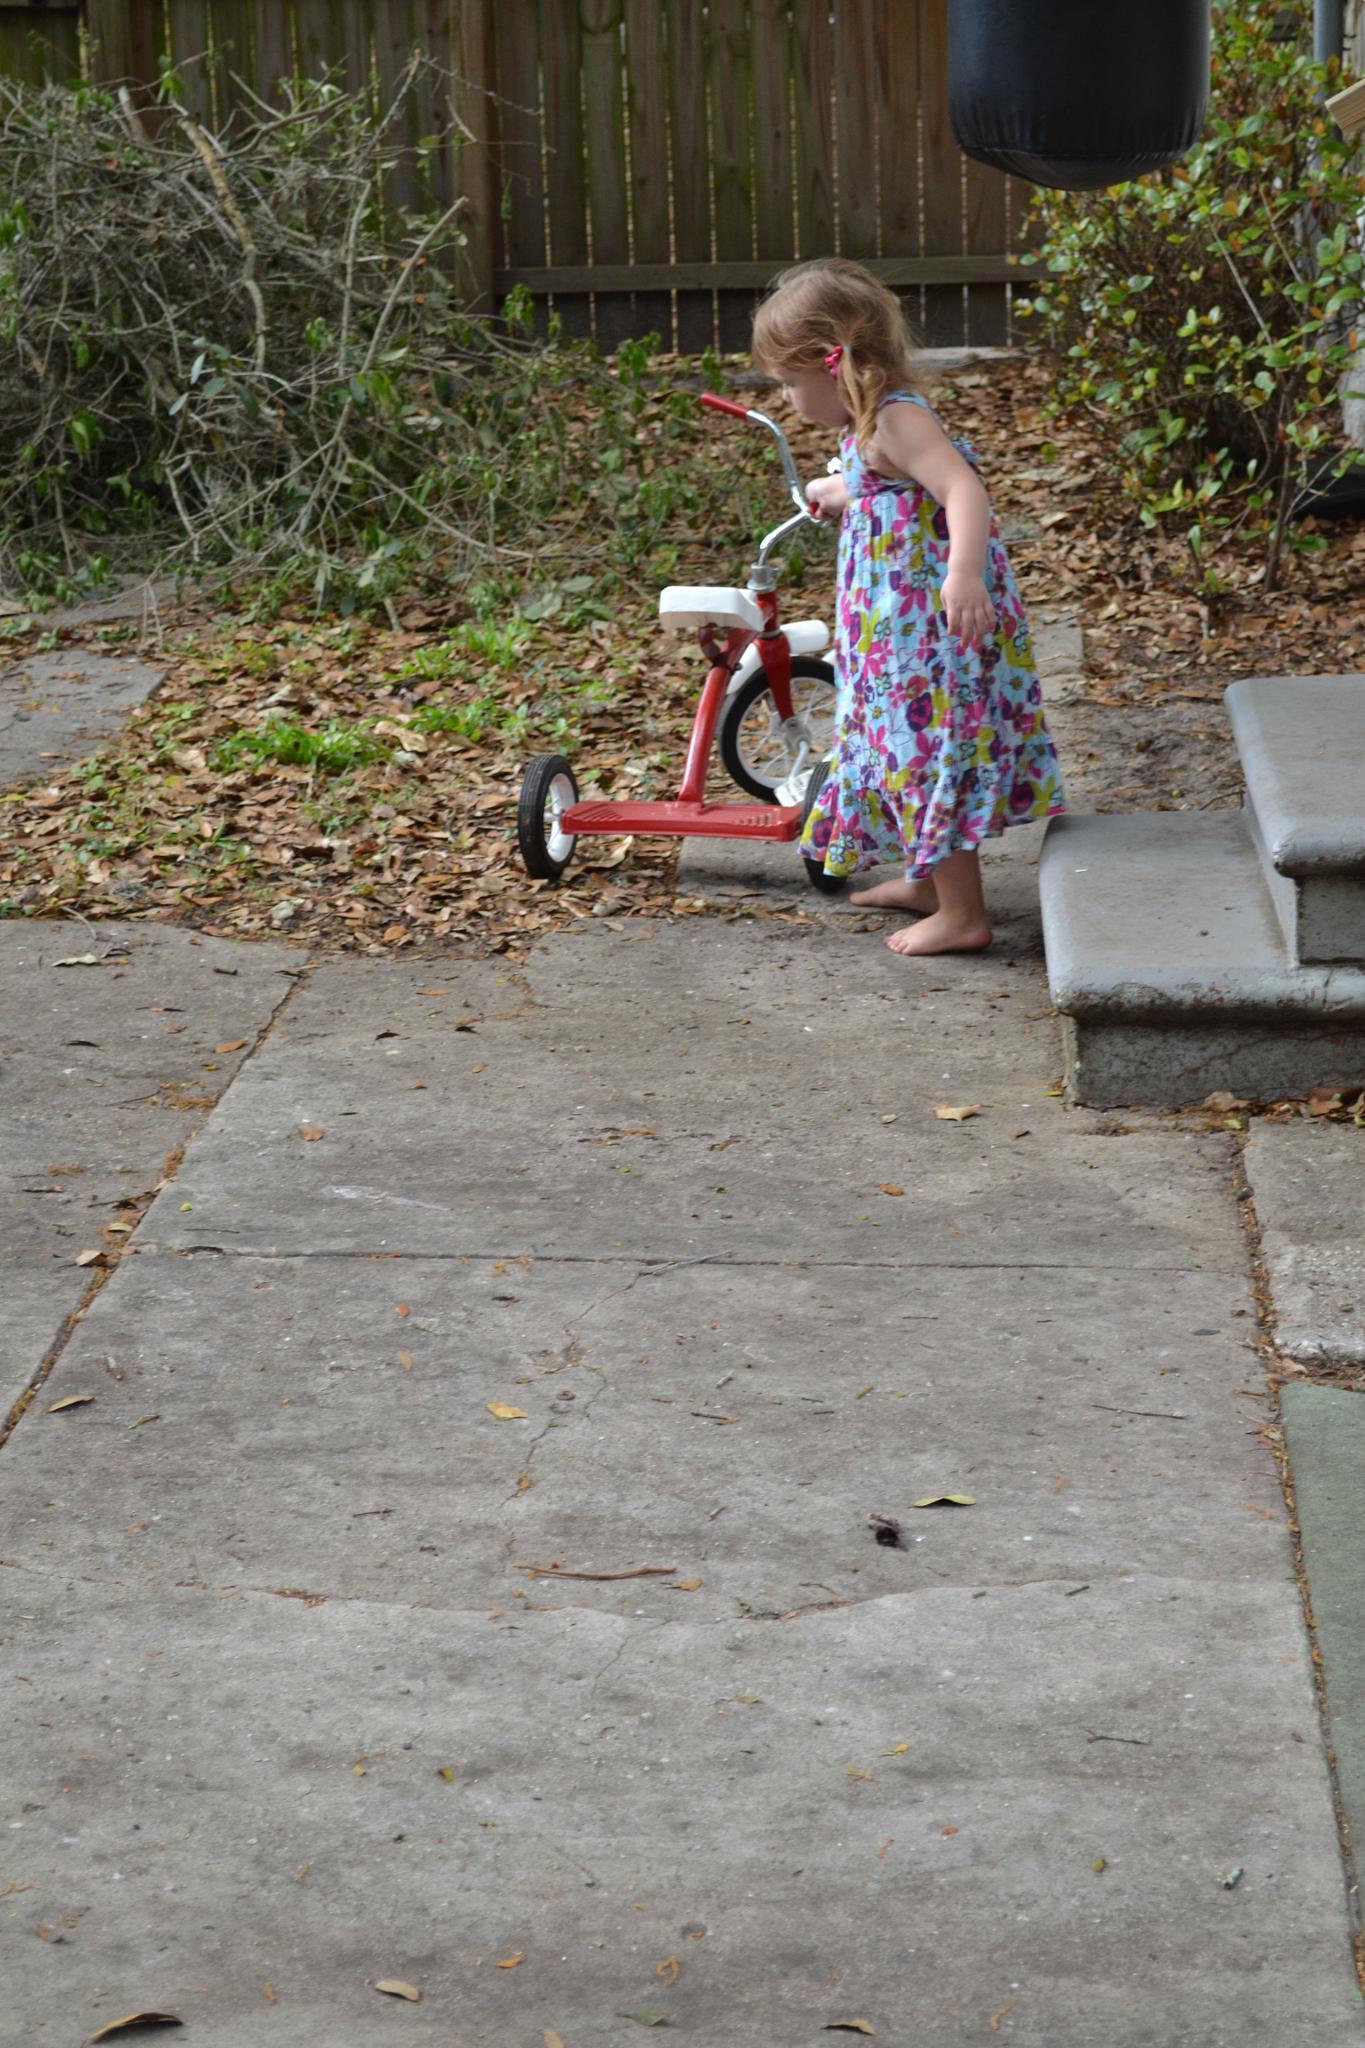 Trike Ride by mary.keenantownsend